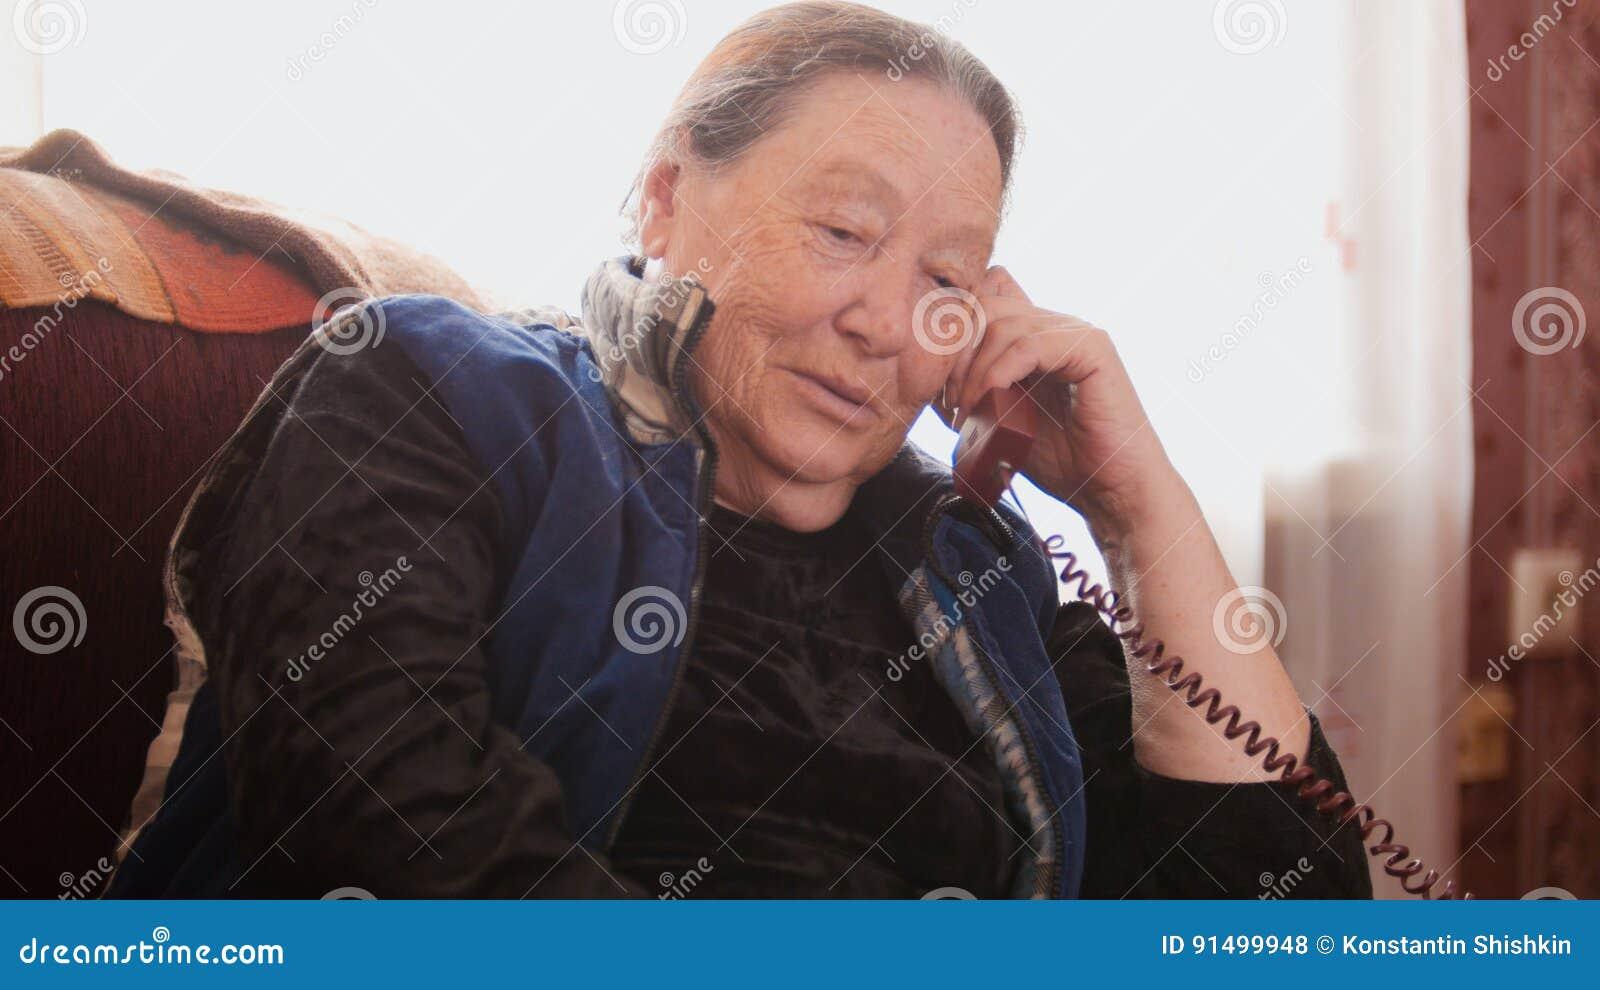 Old Woman pensioner speak landline telephone and smiling, close up